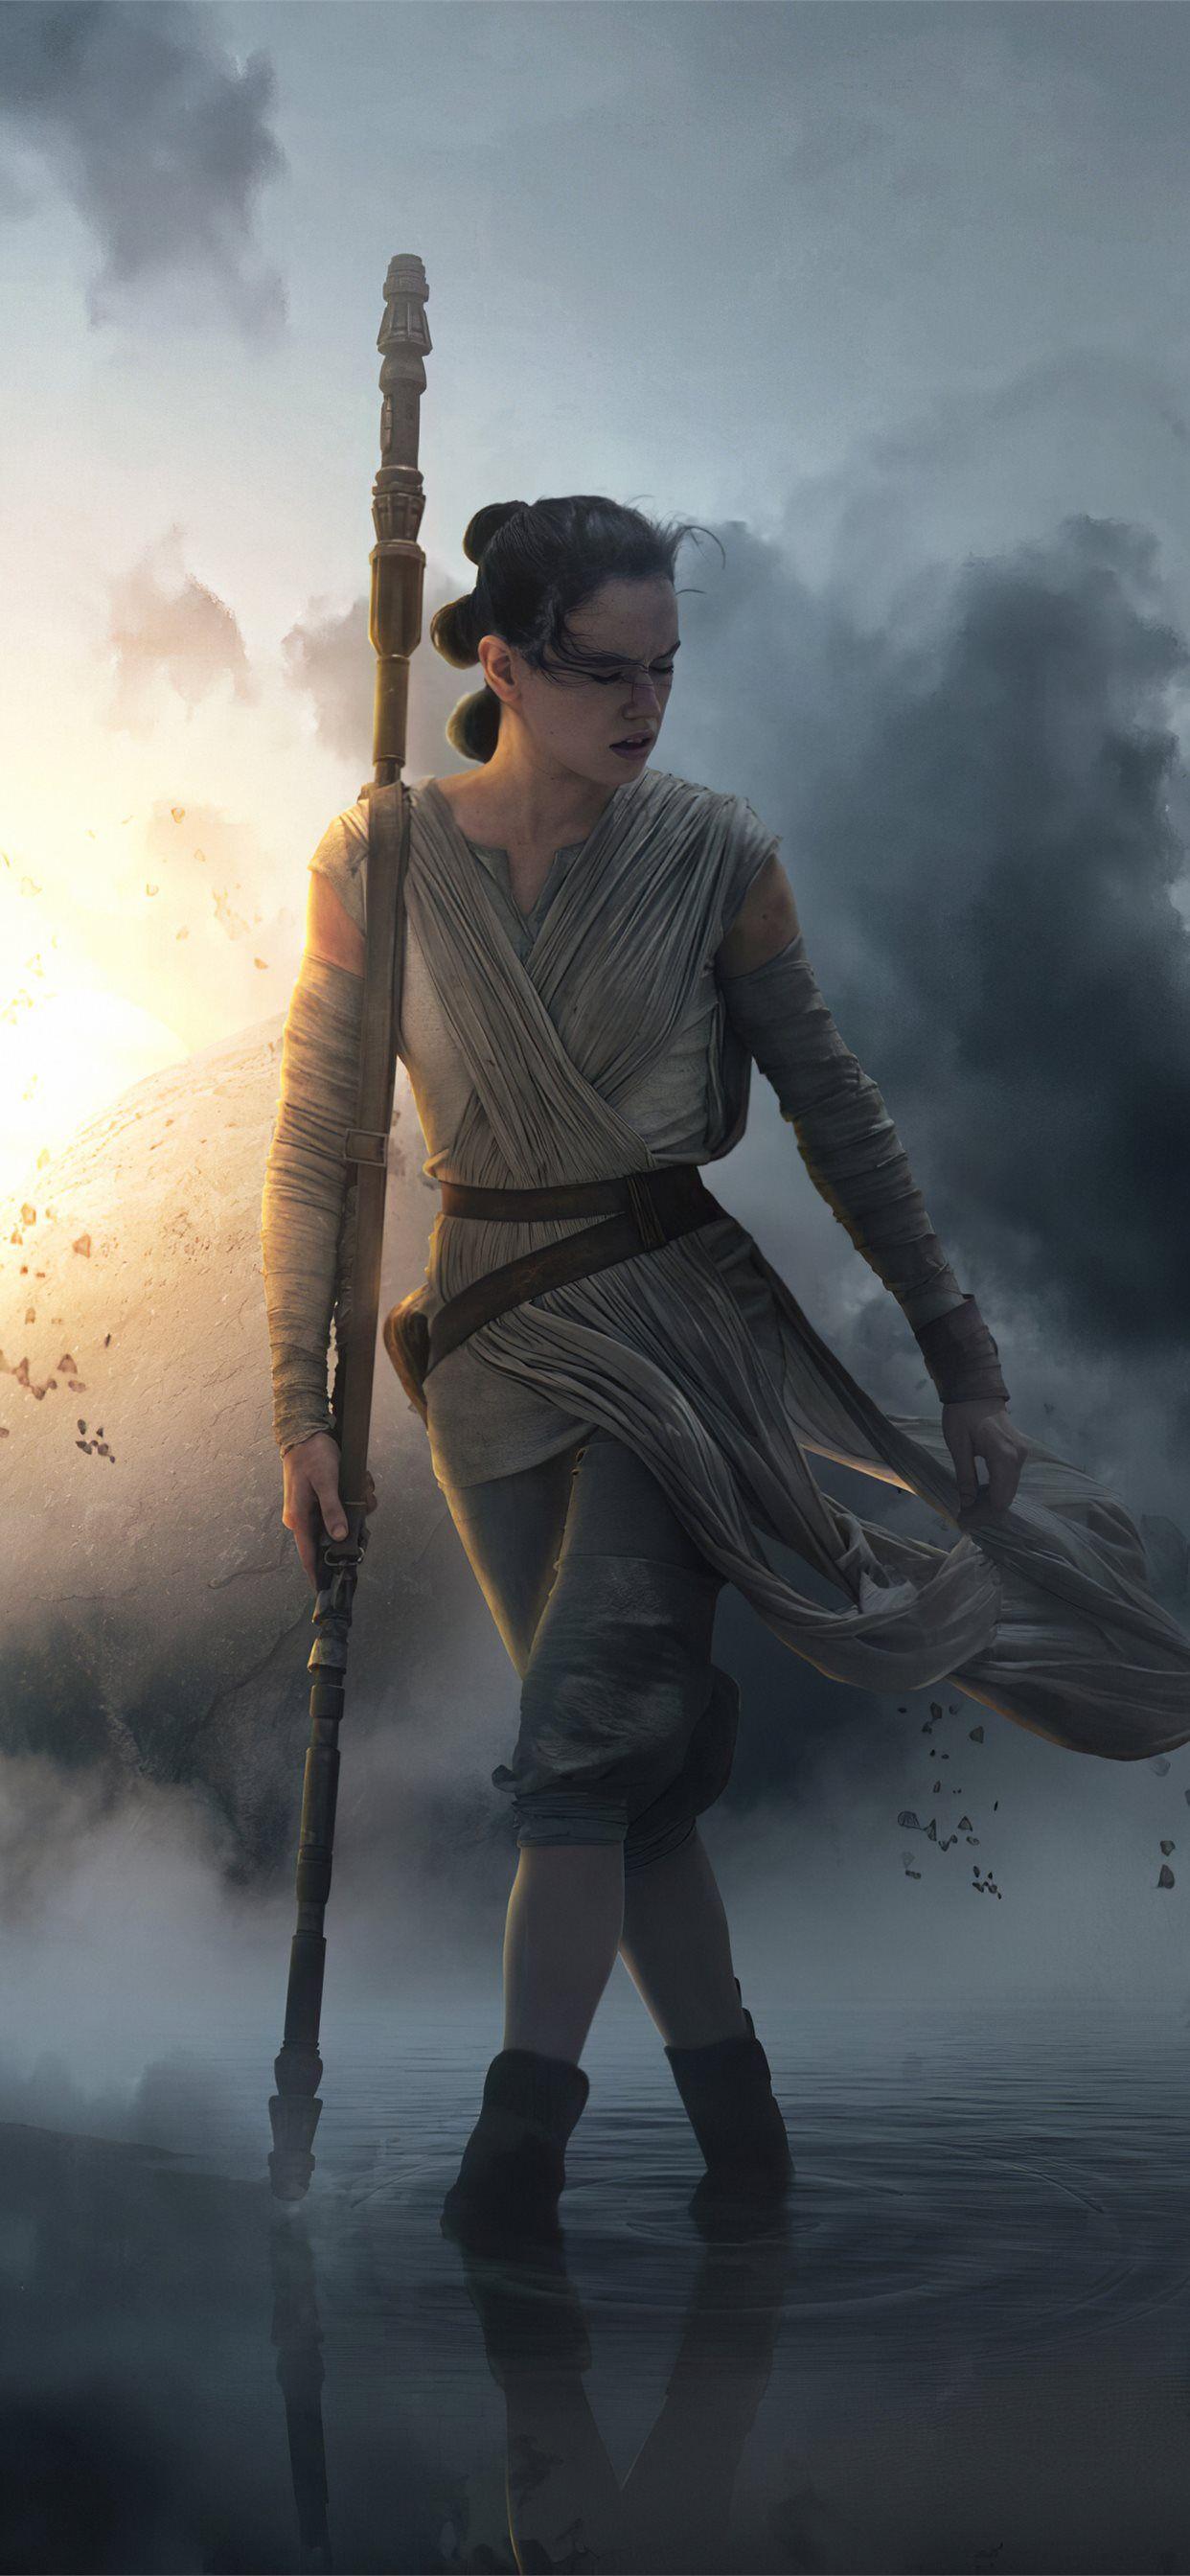 Best Star Wars The Rise Of Skywalker Iphone Wallpapers Hd Rey Star Wars Iphone Wallpapers Top Free Rey Star Wars